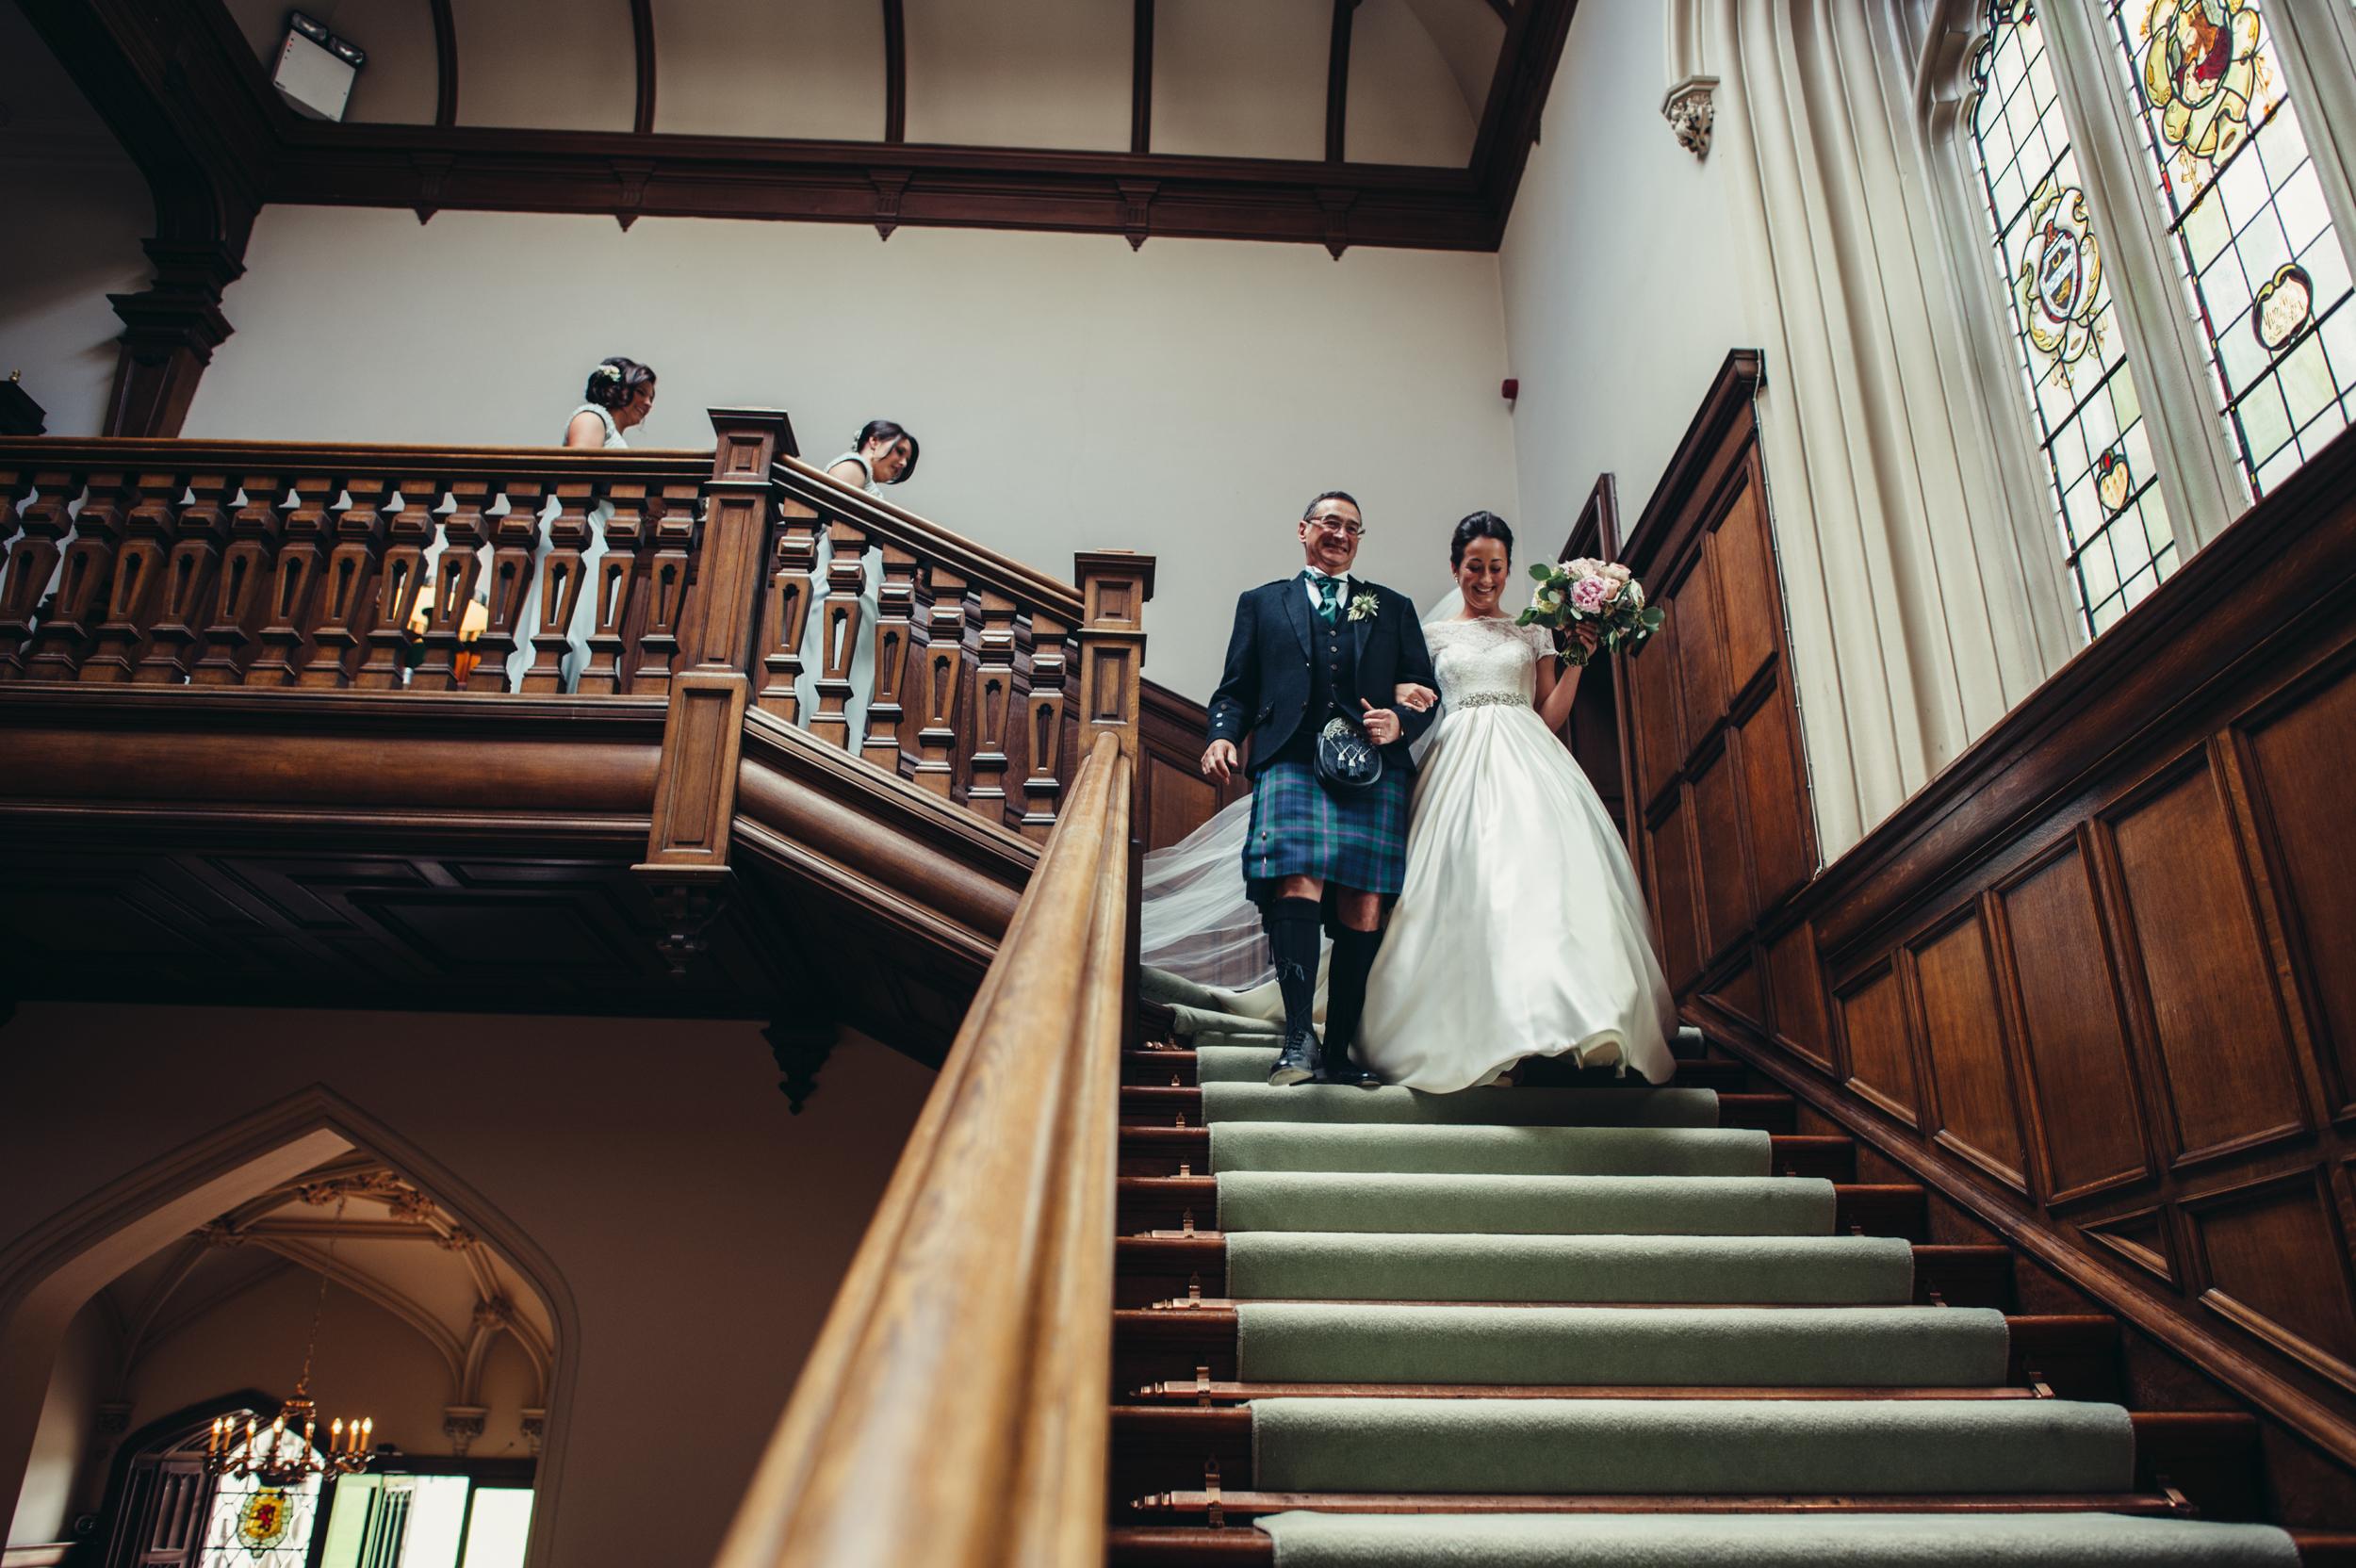 0088-lisa-devine-alternative-creative-wedding-photography-glasgow-edinburgh.JPG